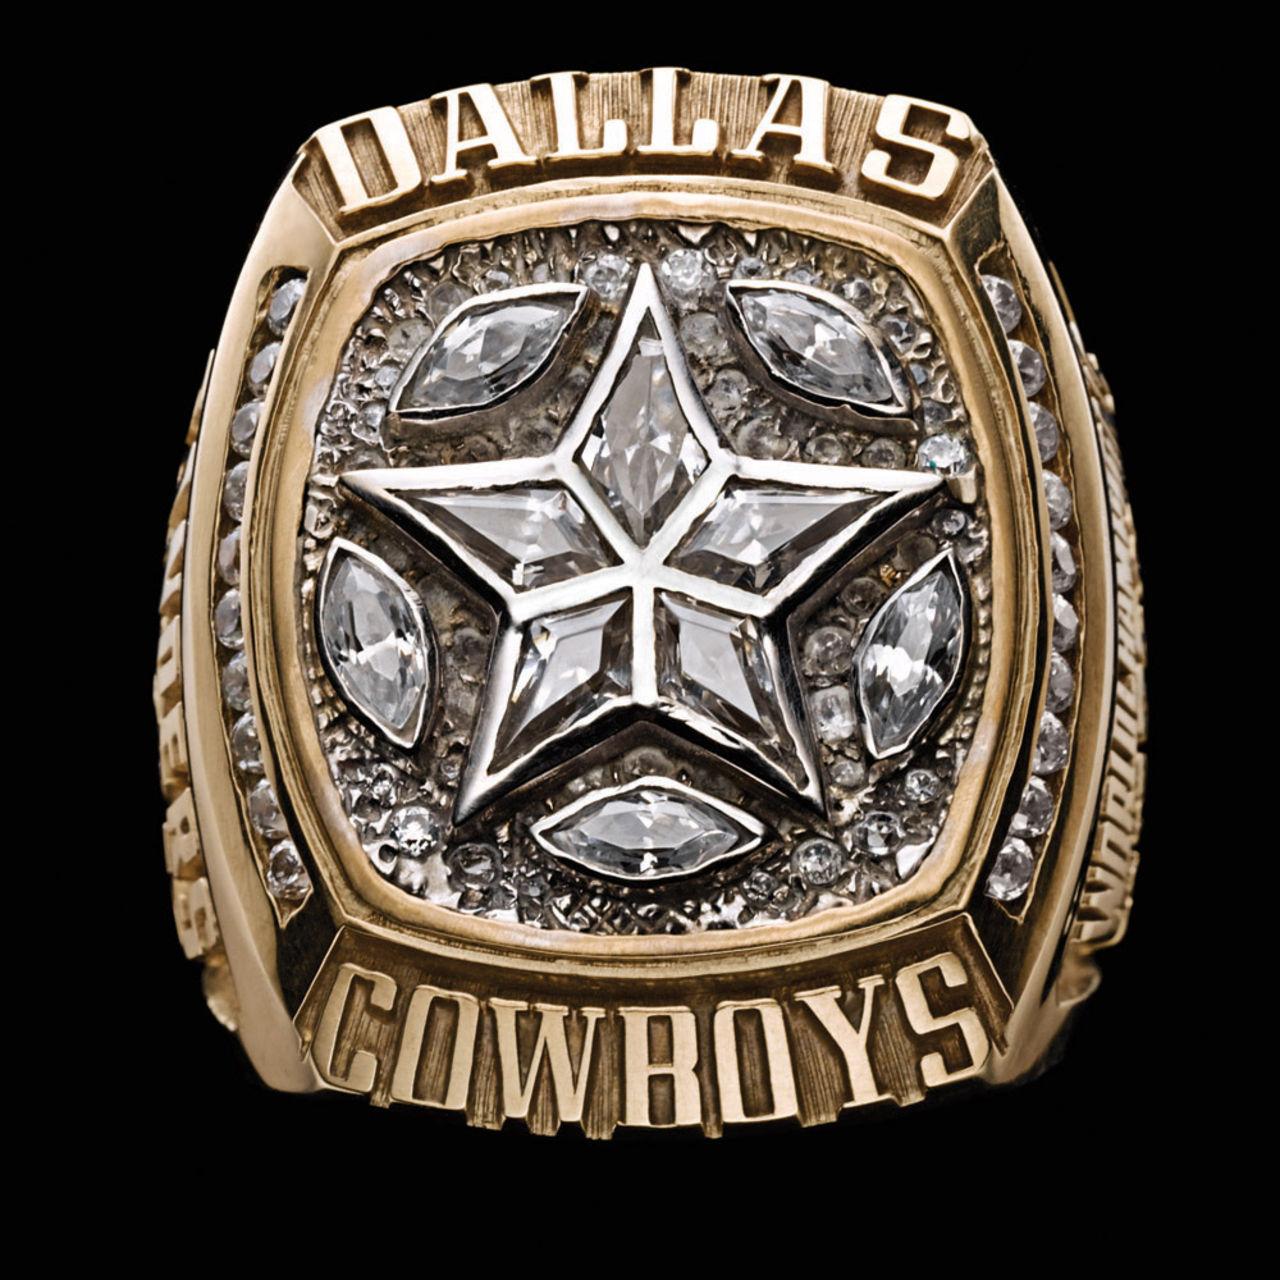 Dallas Cowboys 1996 champions ring